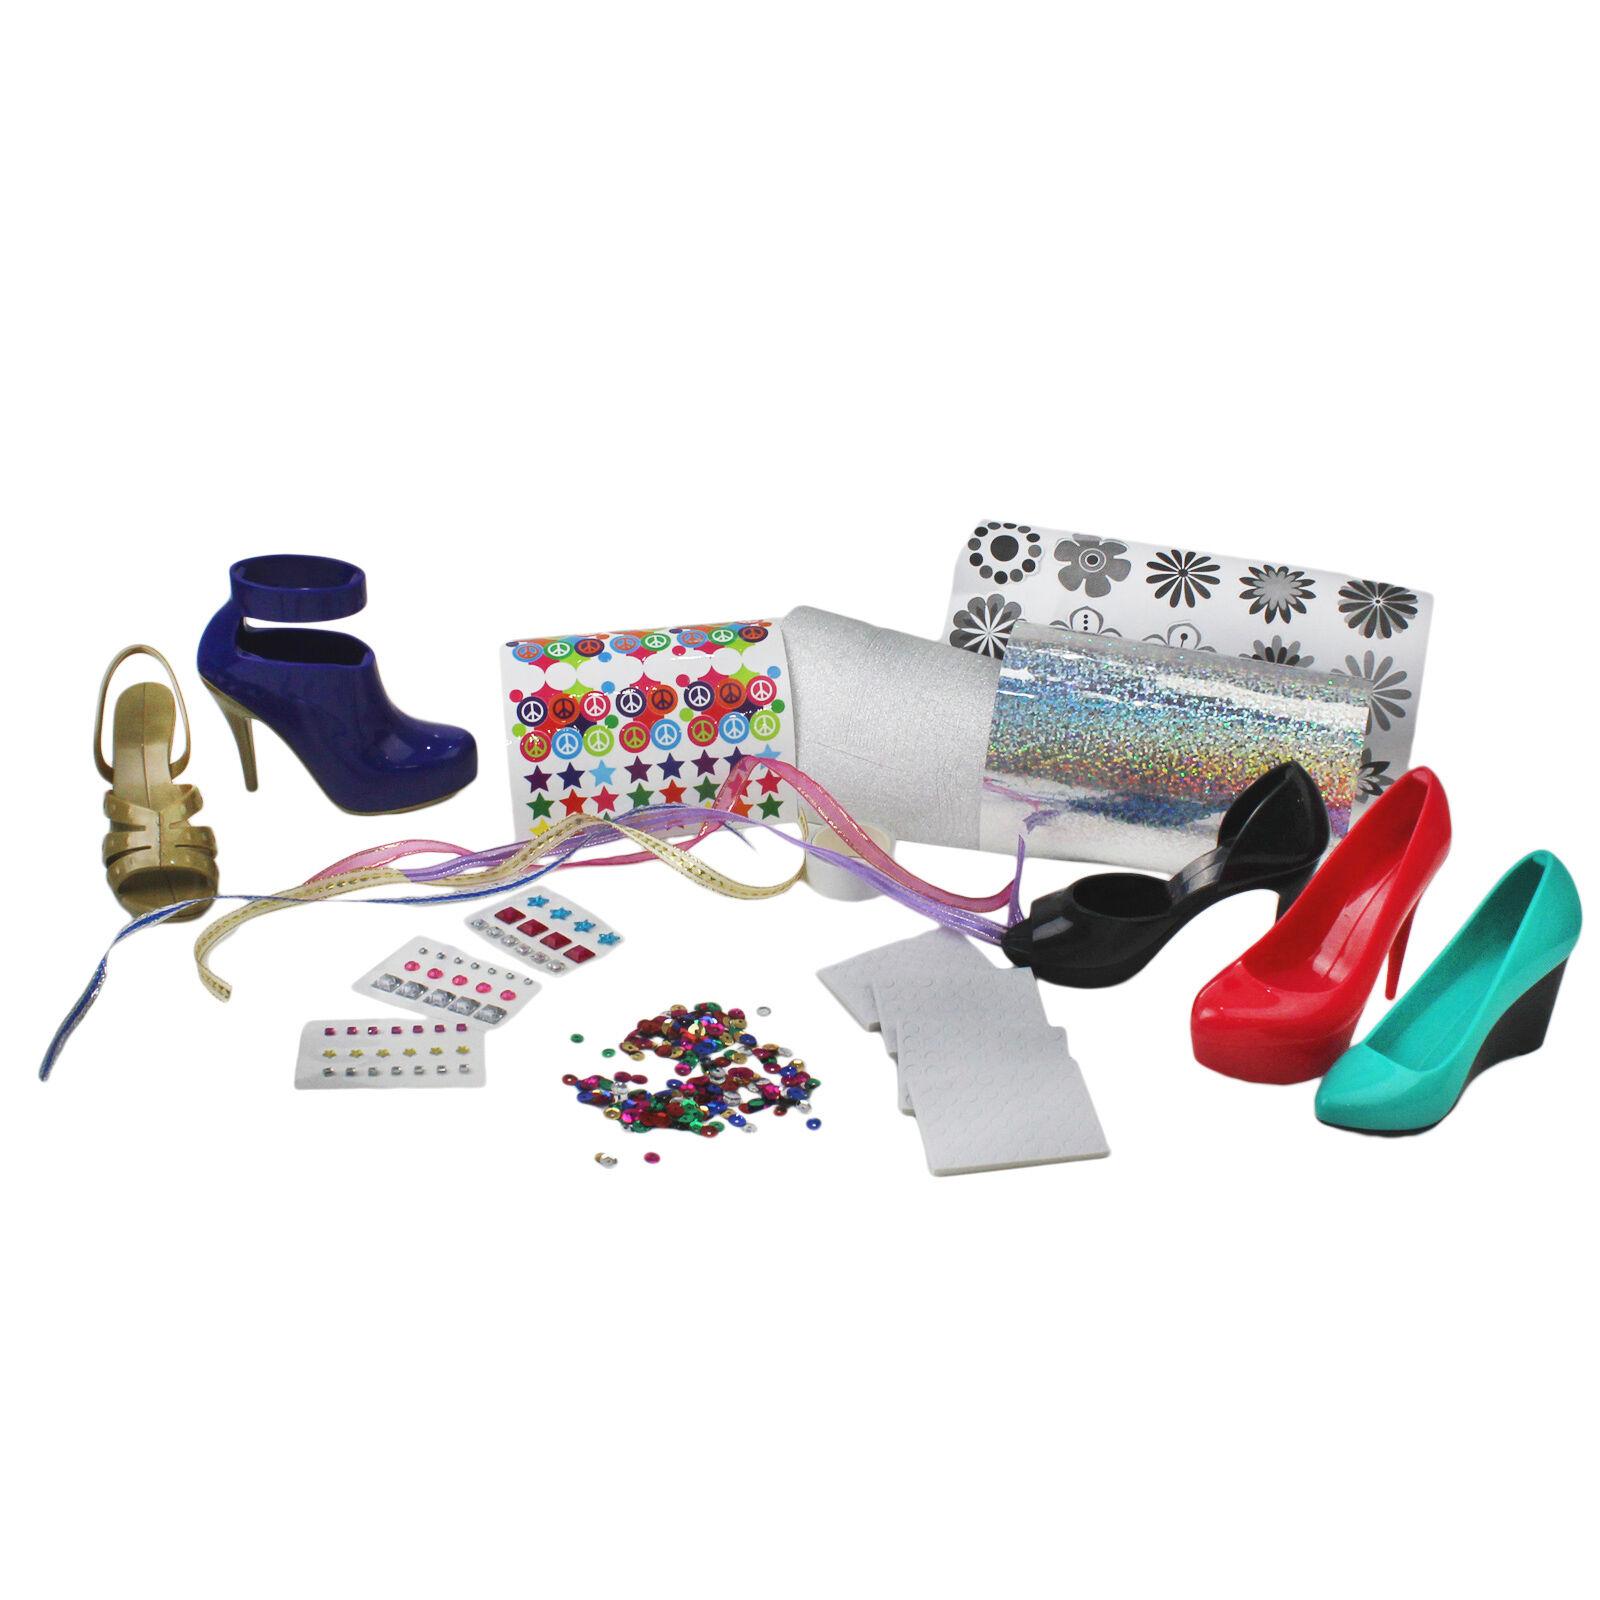 Girls Shoe Design Play Set Crayola Hot Heels Kids Fashion Sticker Art Kit 5 Pack For Sale Online